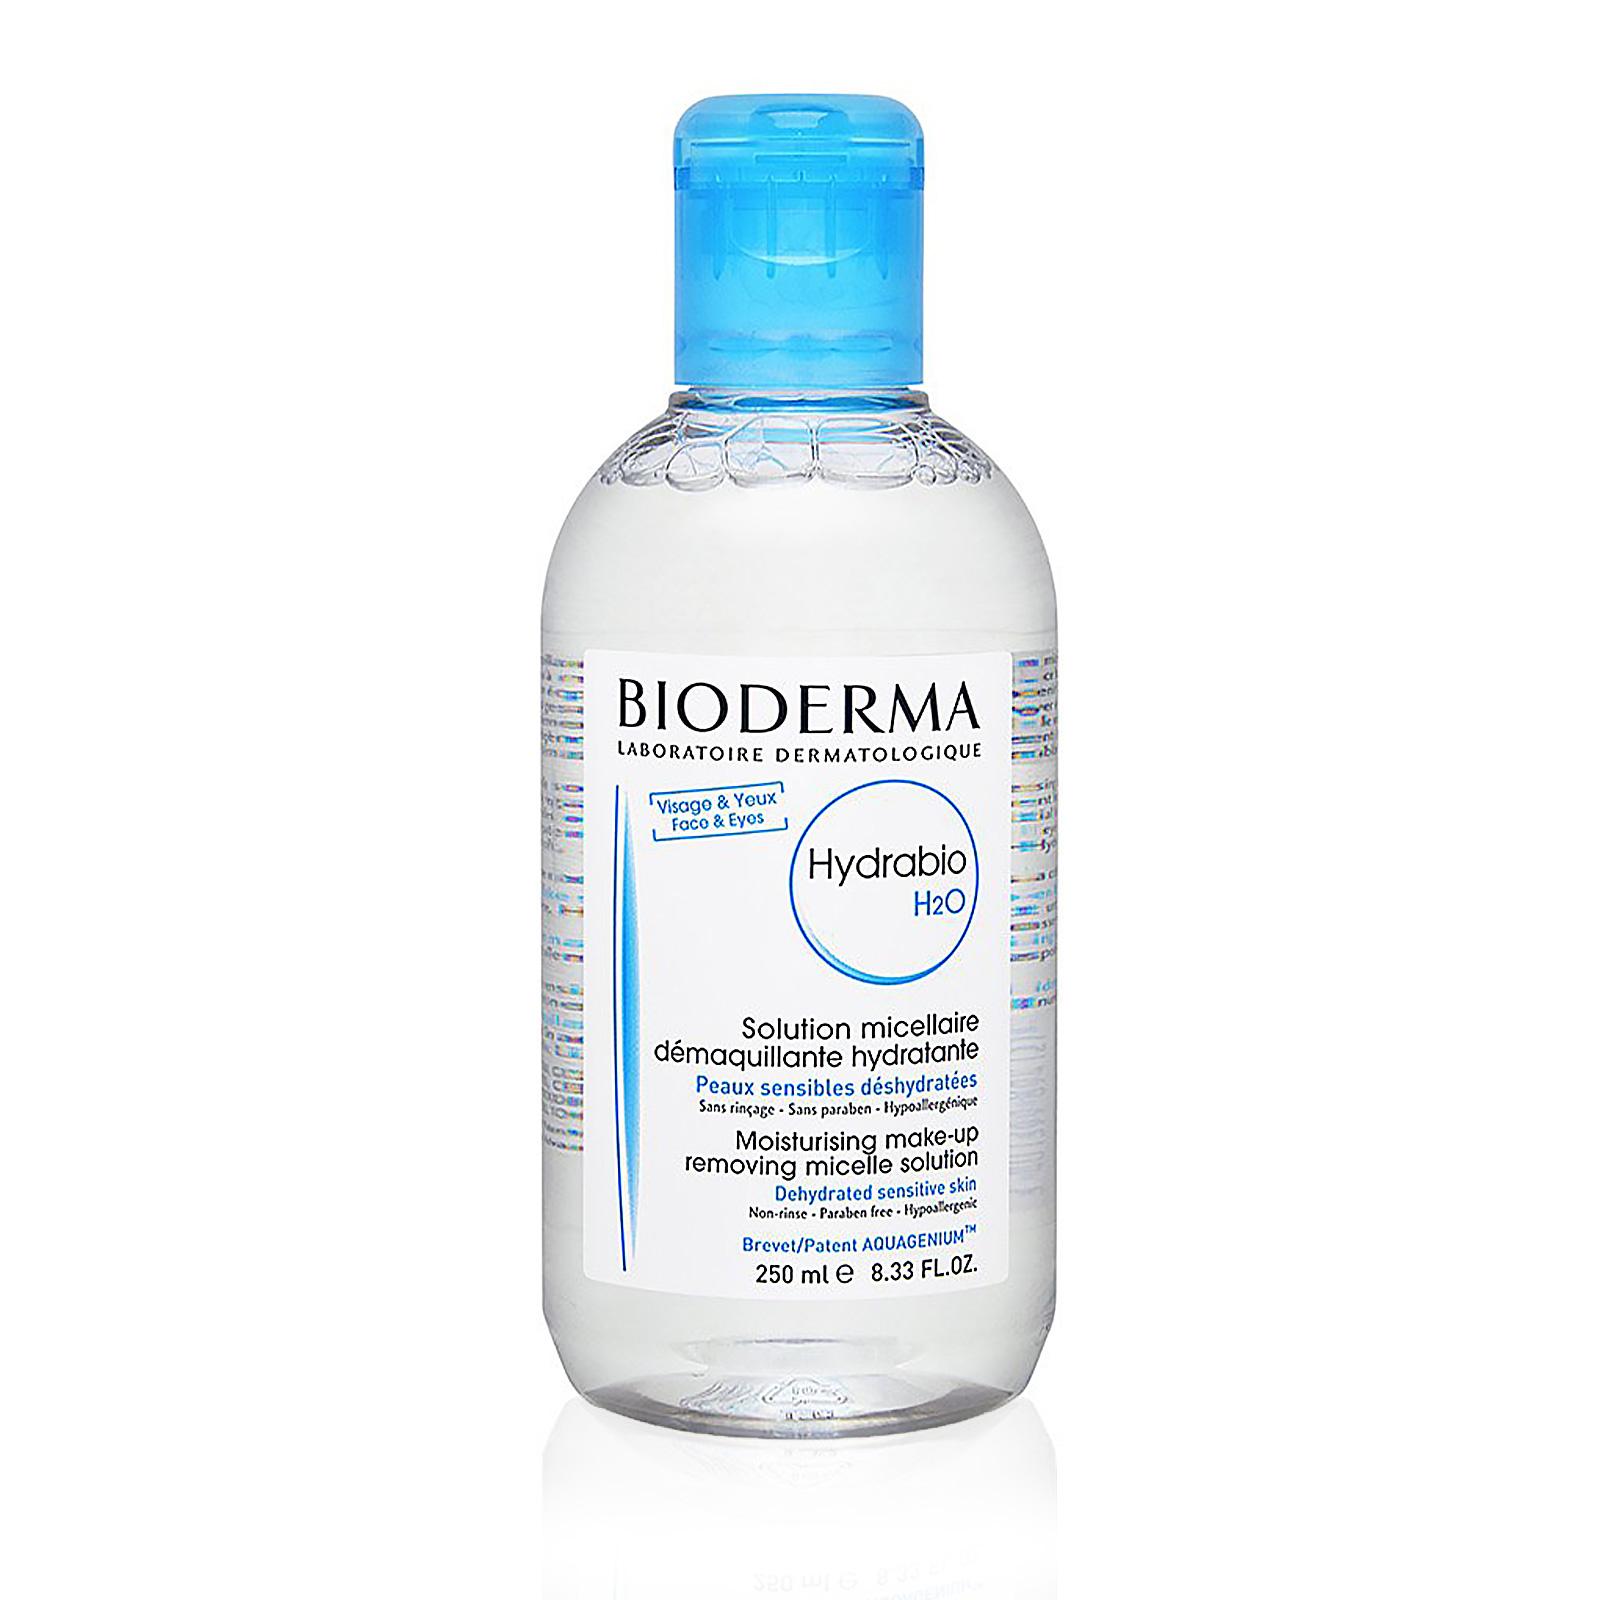 Hydrabio H2O Micelle Solution (Sensitve Dehydrated Skin)